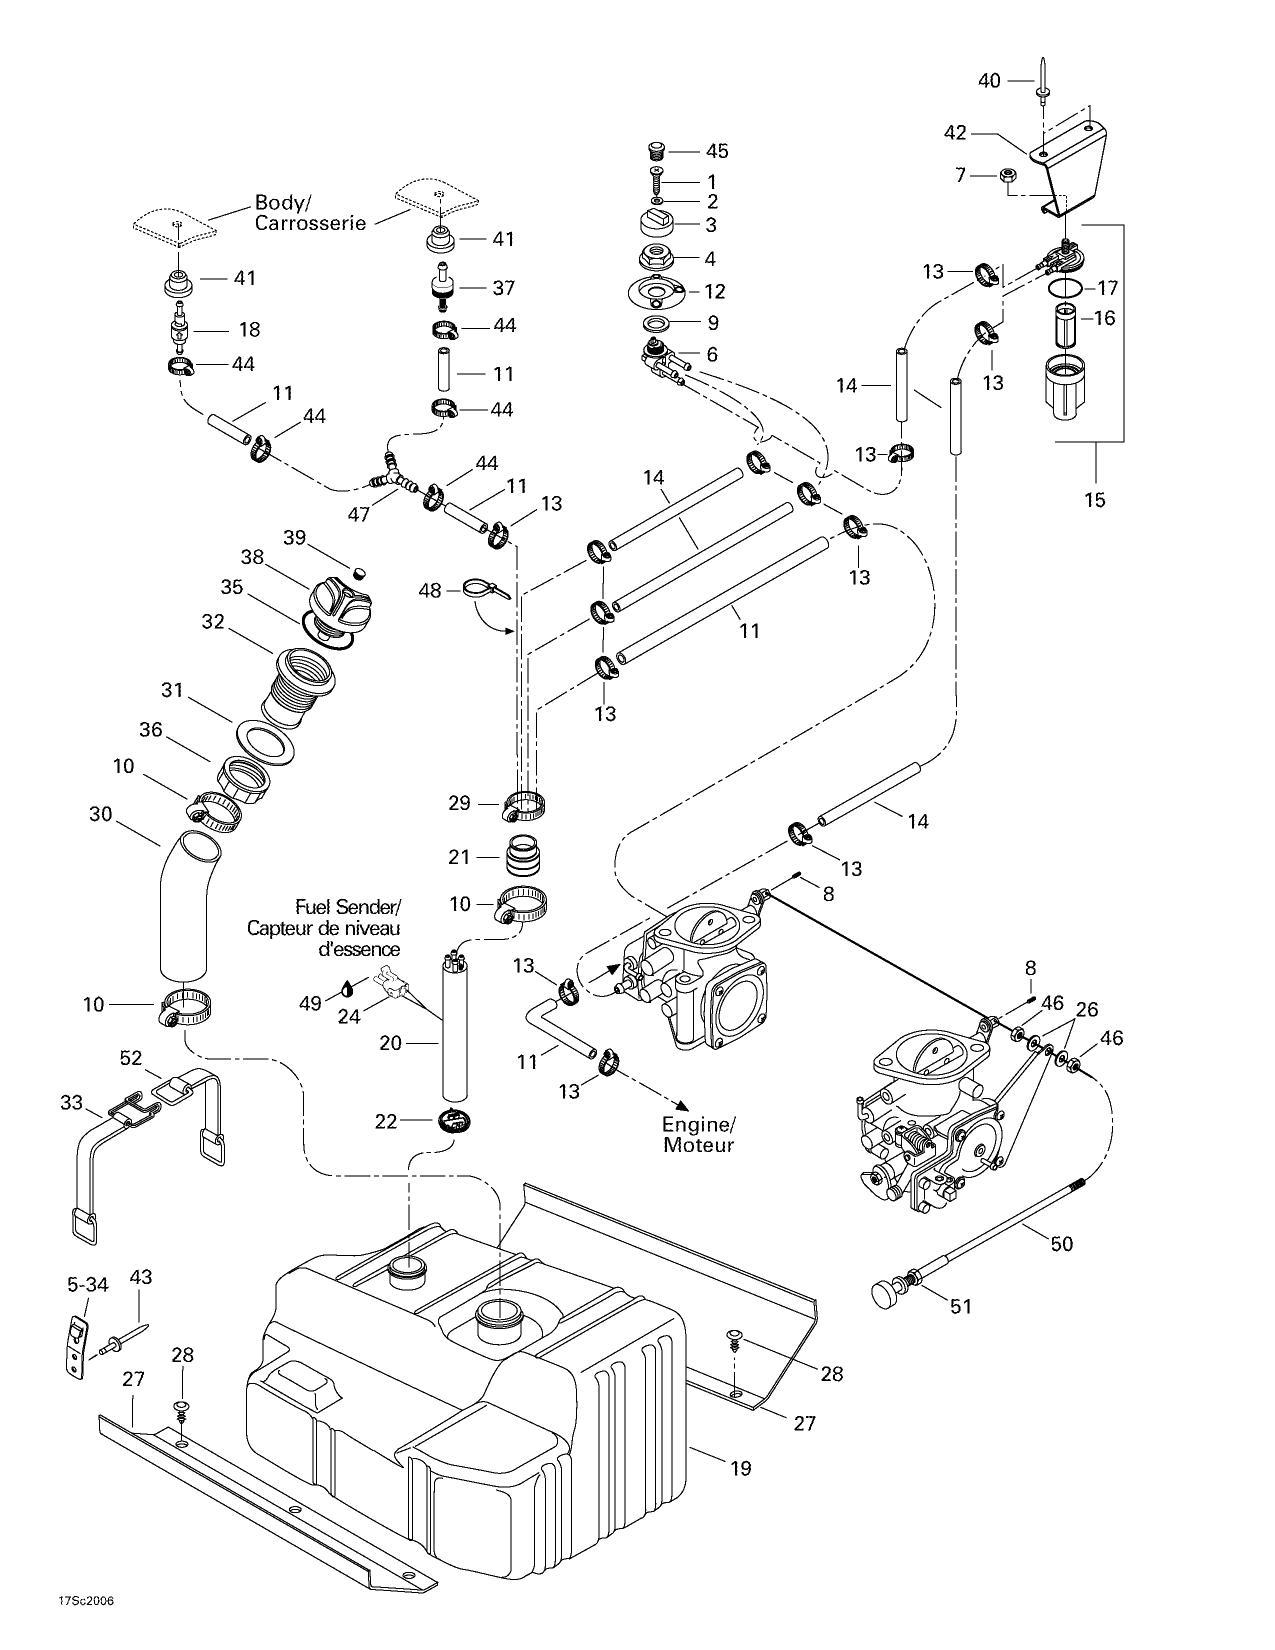 1993 Seadoo Xp Wiring Diagram - Wiring Diagram